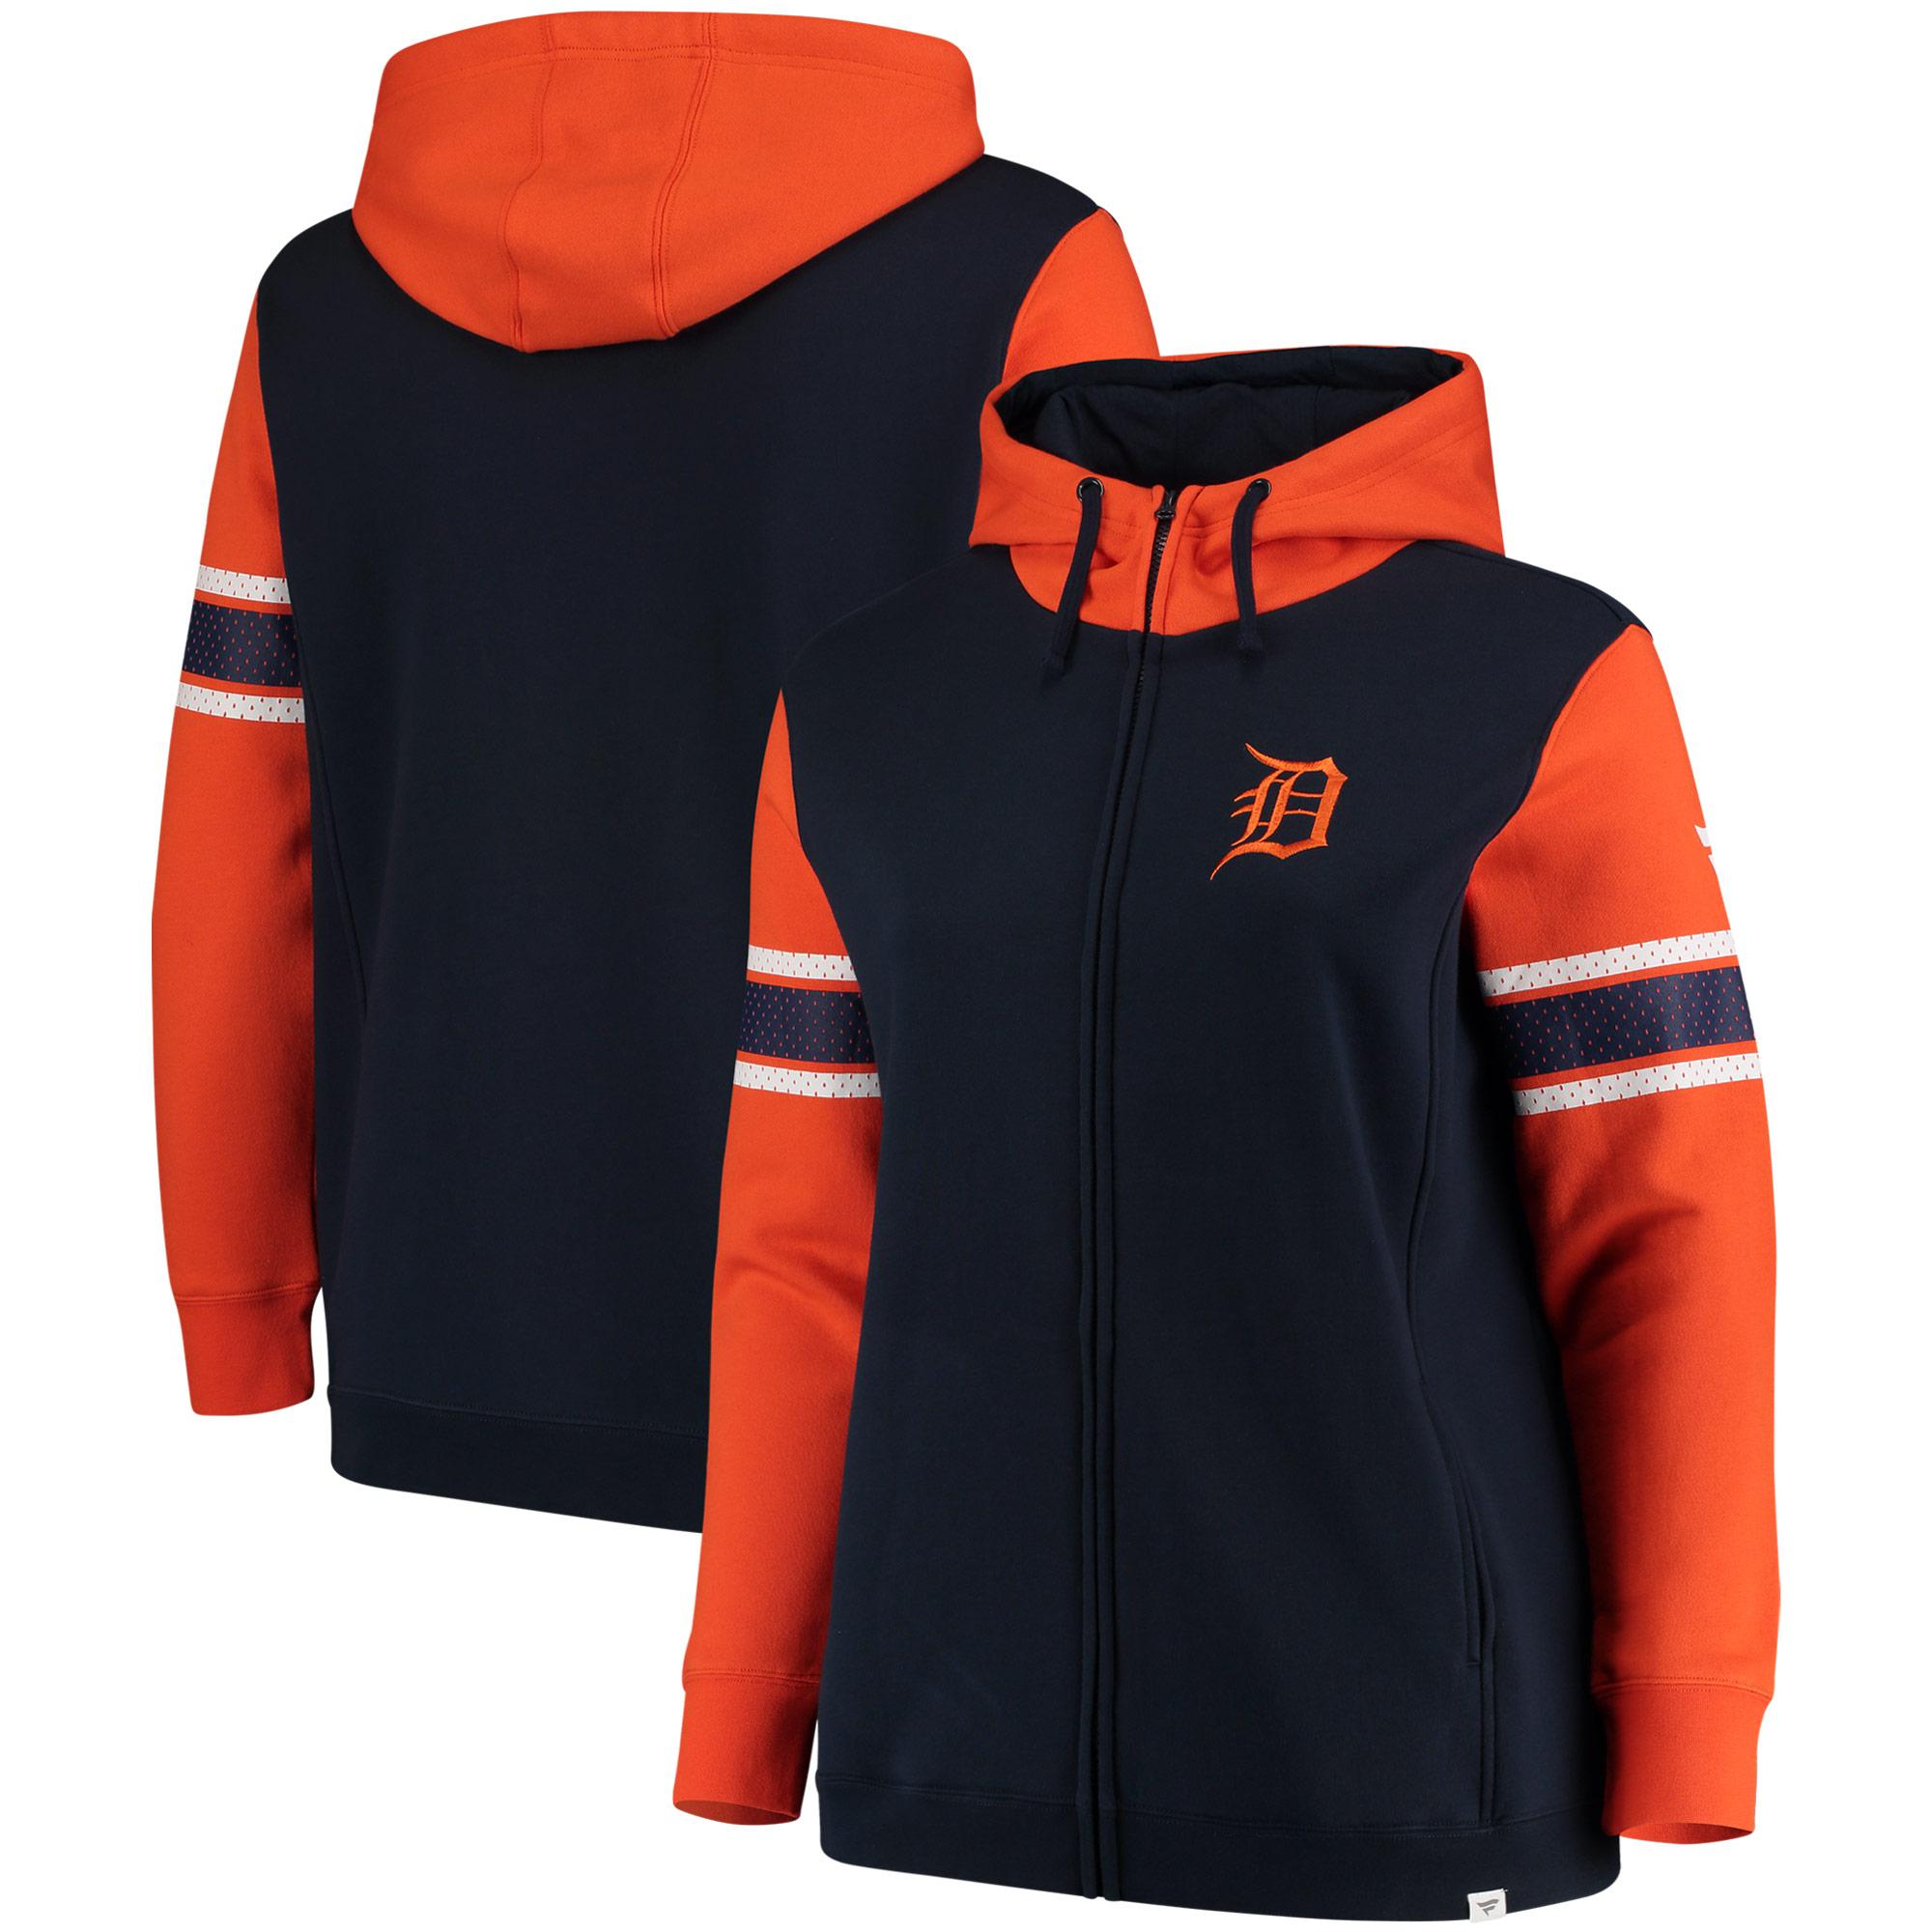 online store 3873a 9fd94 Detroit Tigers Fanatics Branded Women's Plus Size Iconic Fleece Full Zip  Hoodie Navy